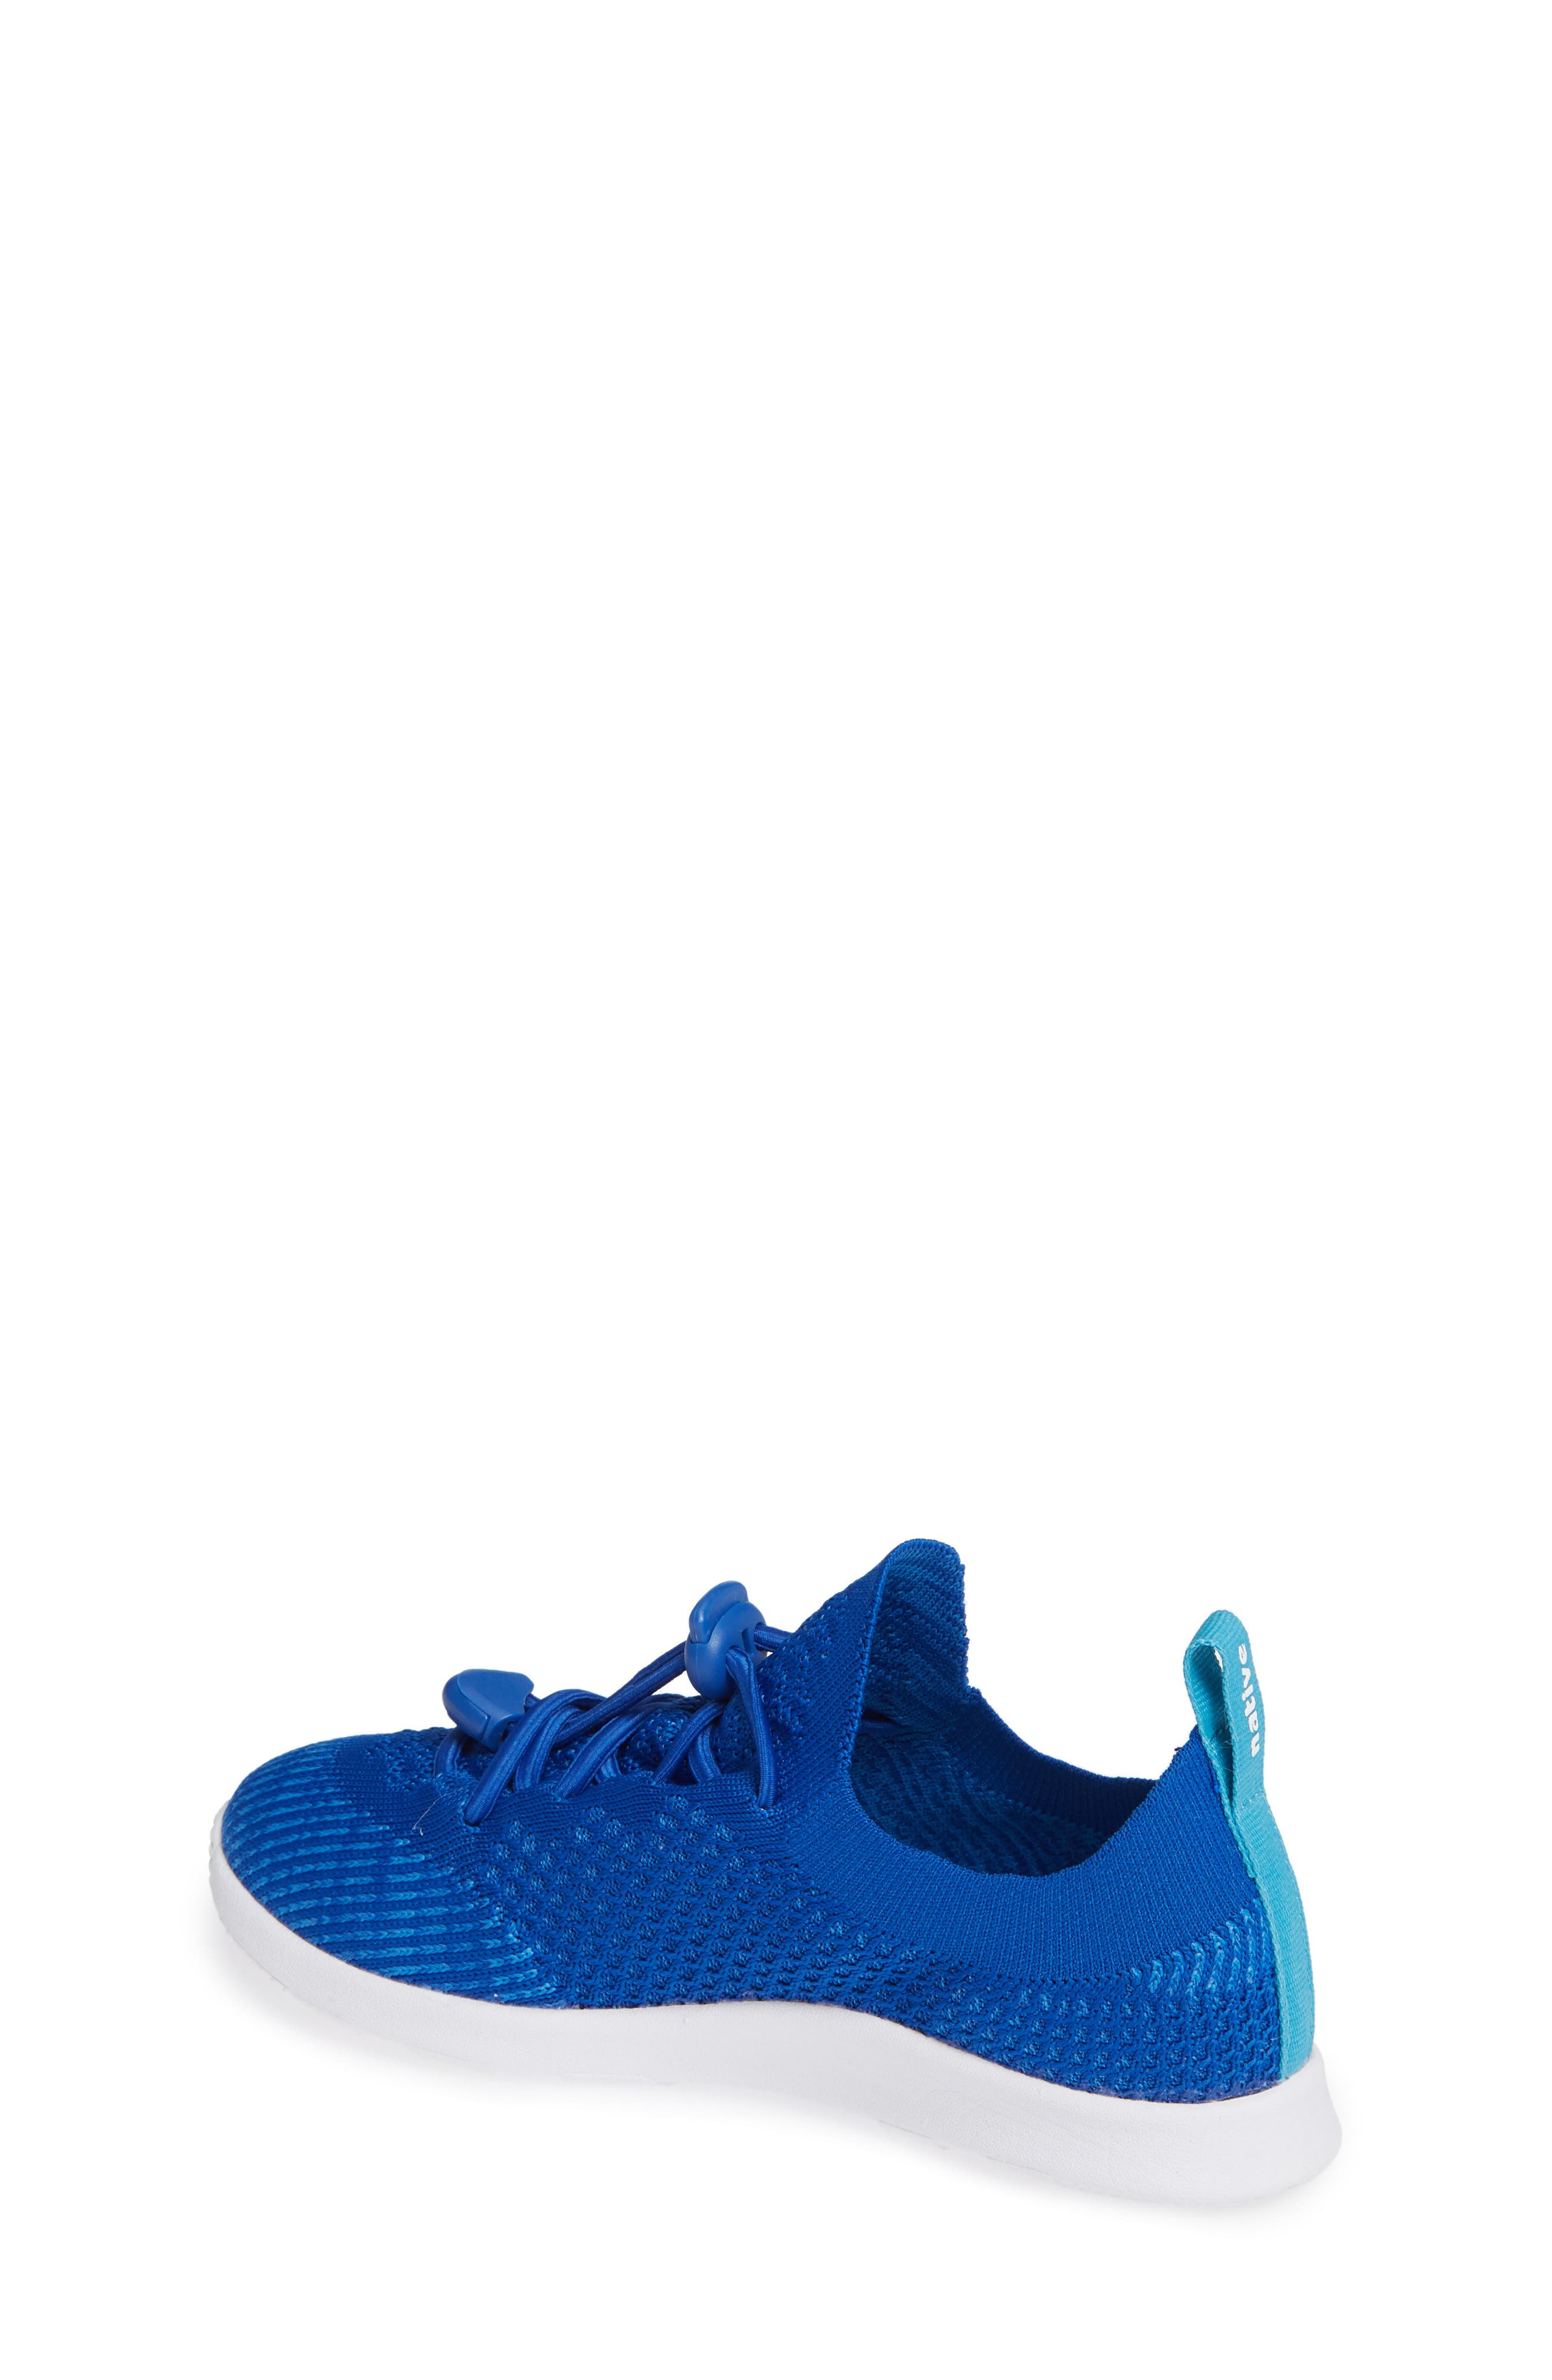 AP Mercury LiteKnit Sneaker,                             Alternate thumbnail 2, color,                             VICTORIA BLUE/ SHELL WHITE